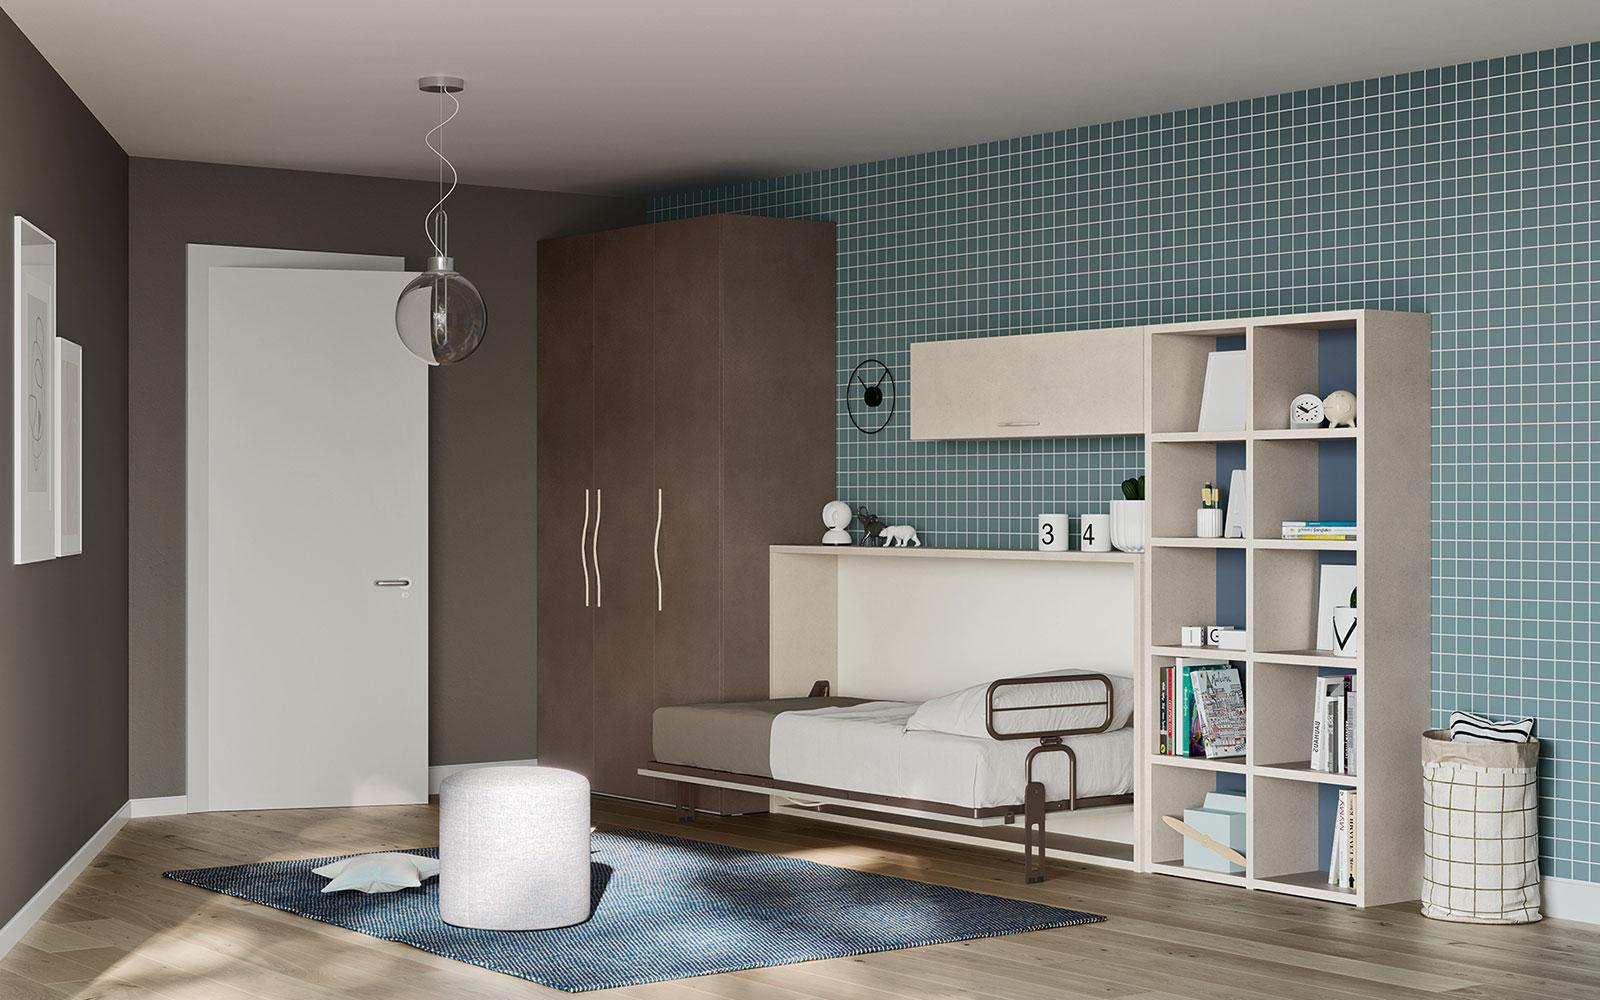 camerette-mobili-ricci03